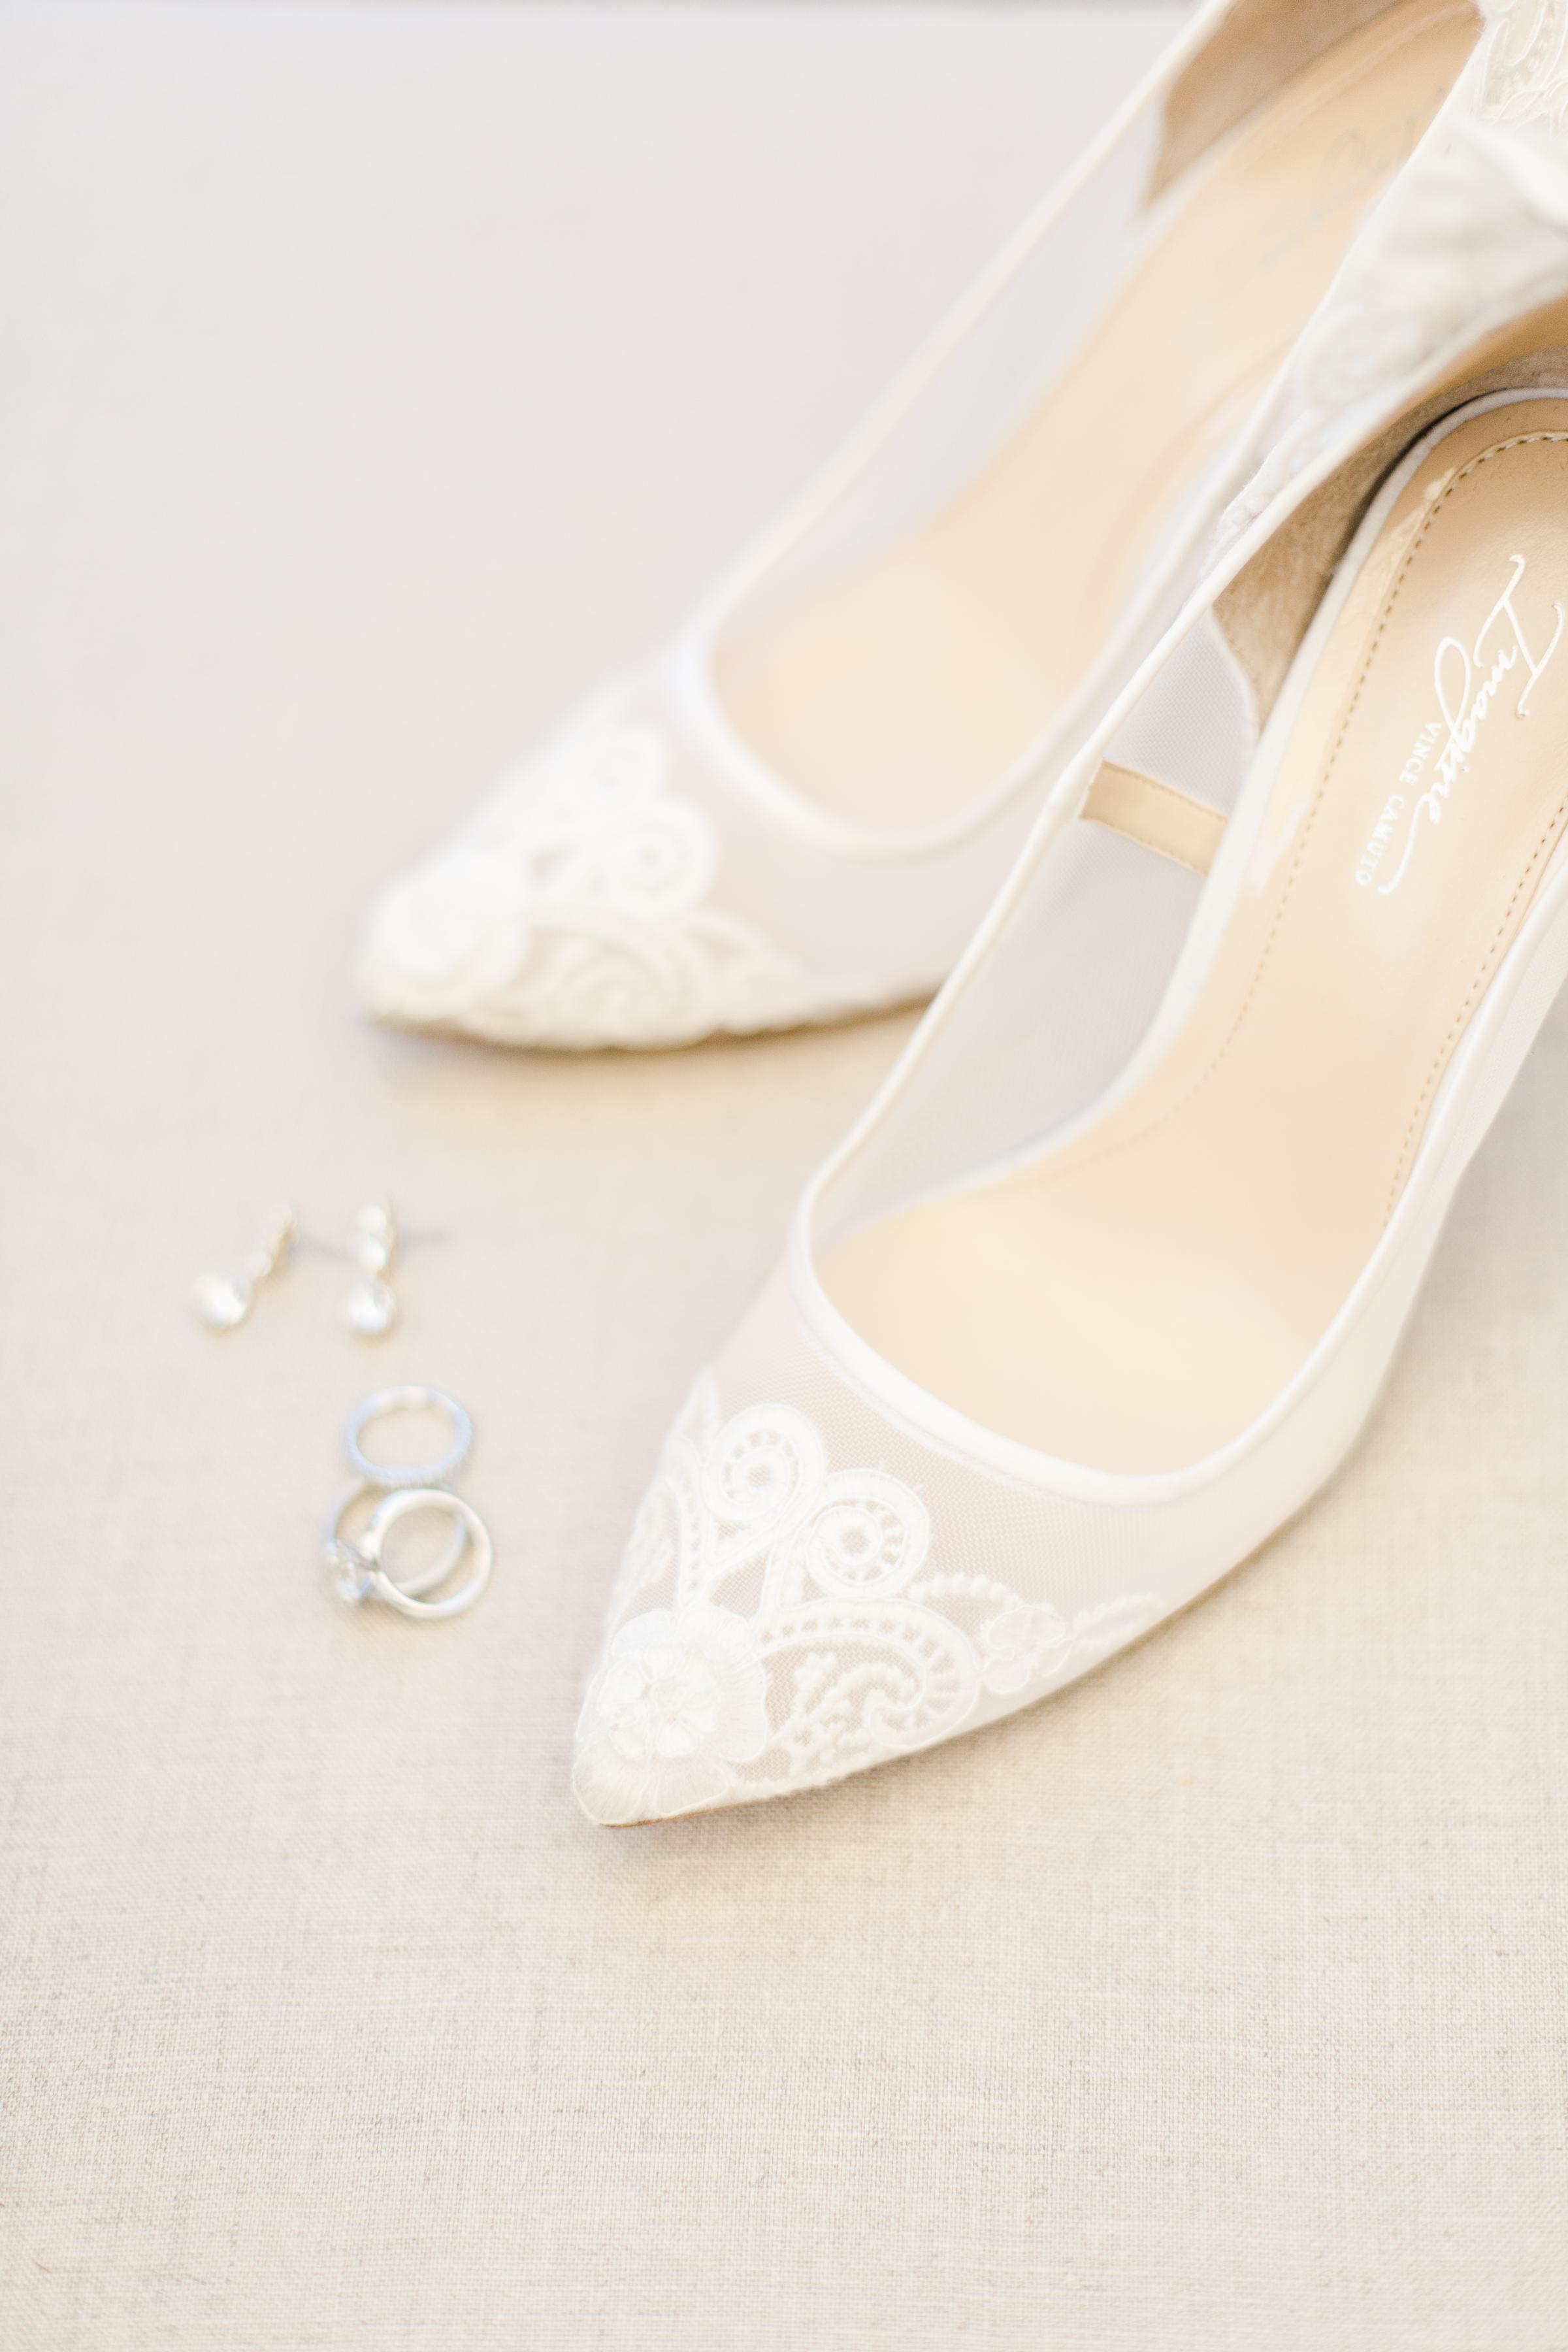 maravilla-gardens-camarillo-los-angeles-ca-california-wedding-pictures-pic0020.jpg